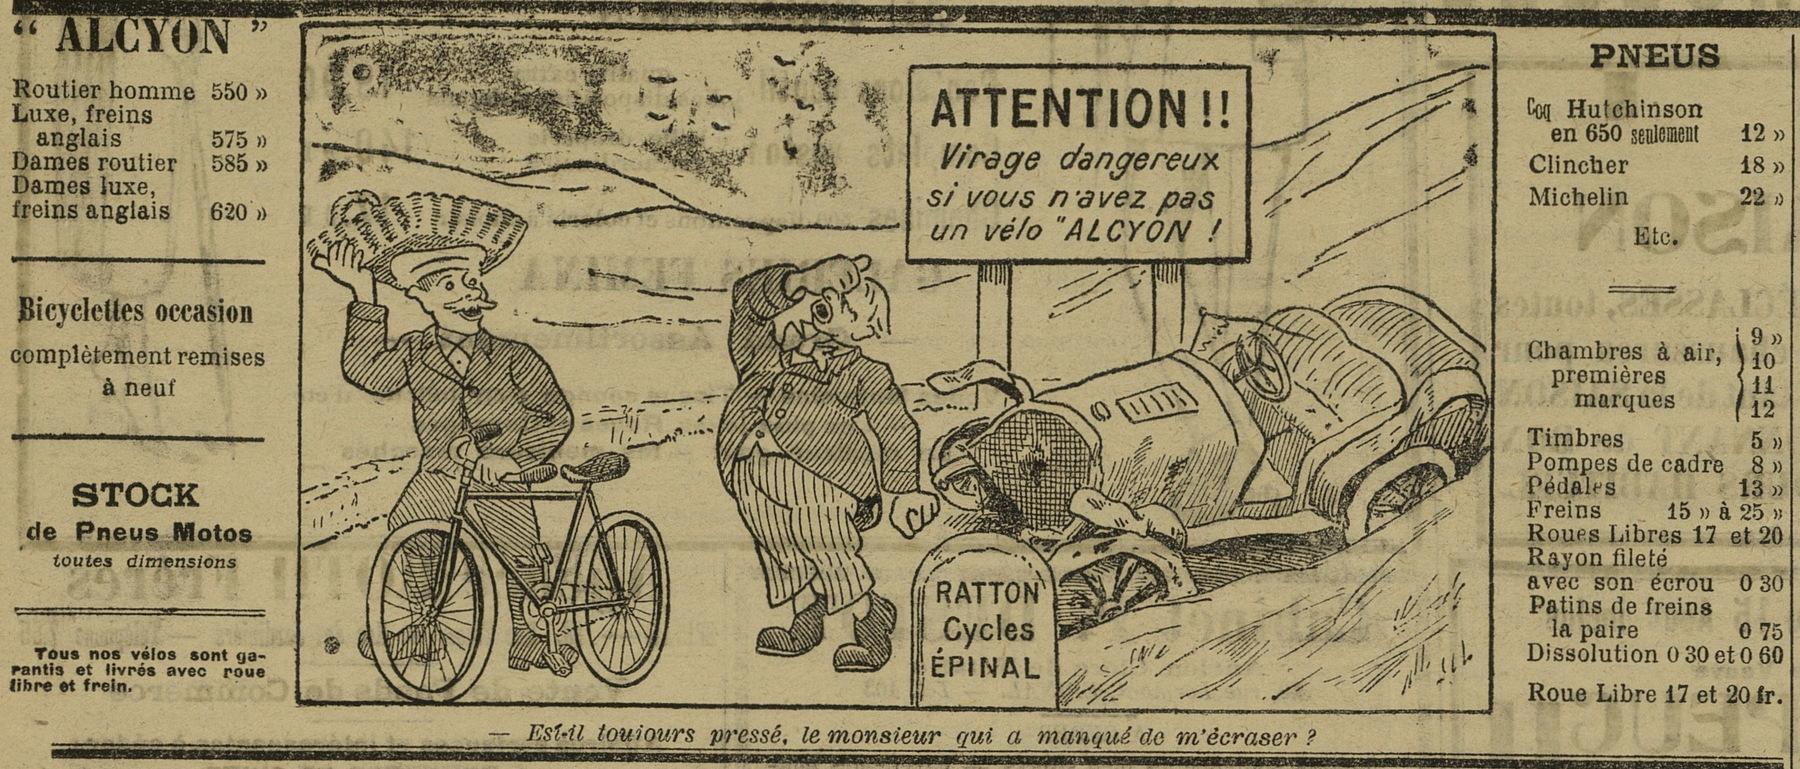 Contenu du Vélo Alcyon